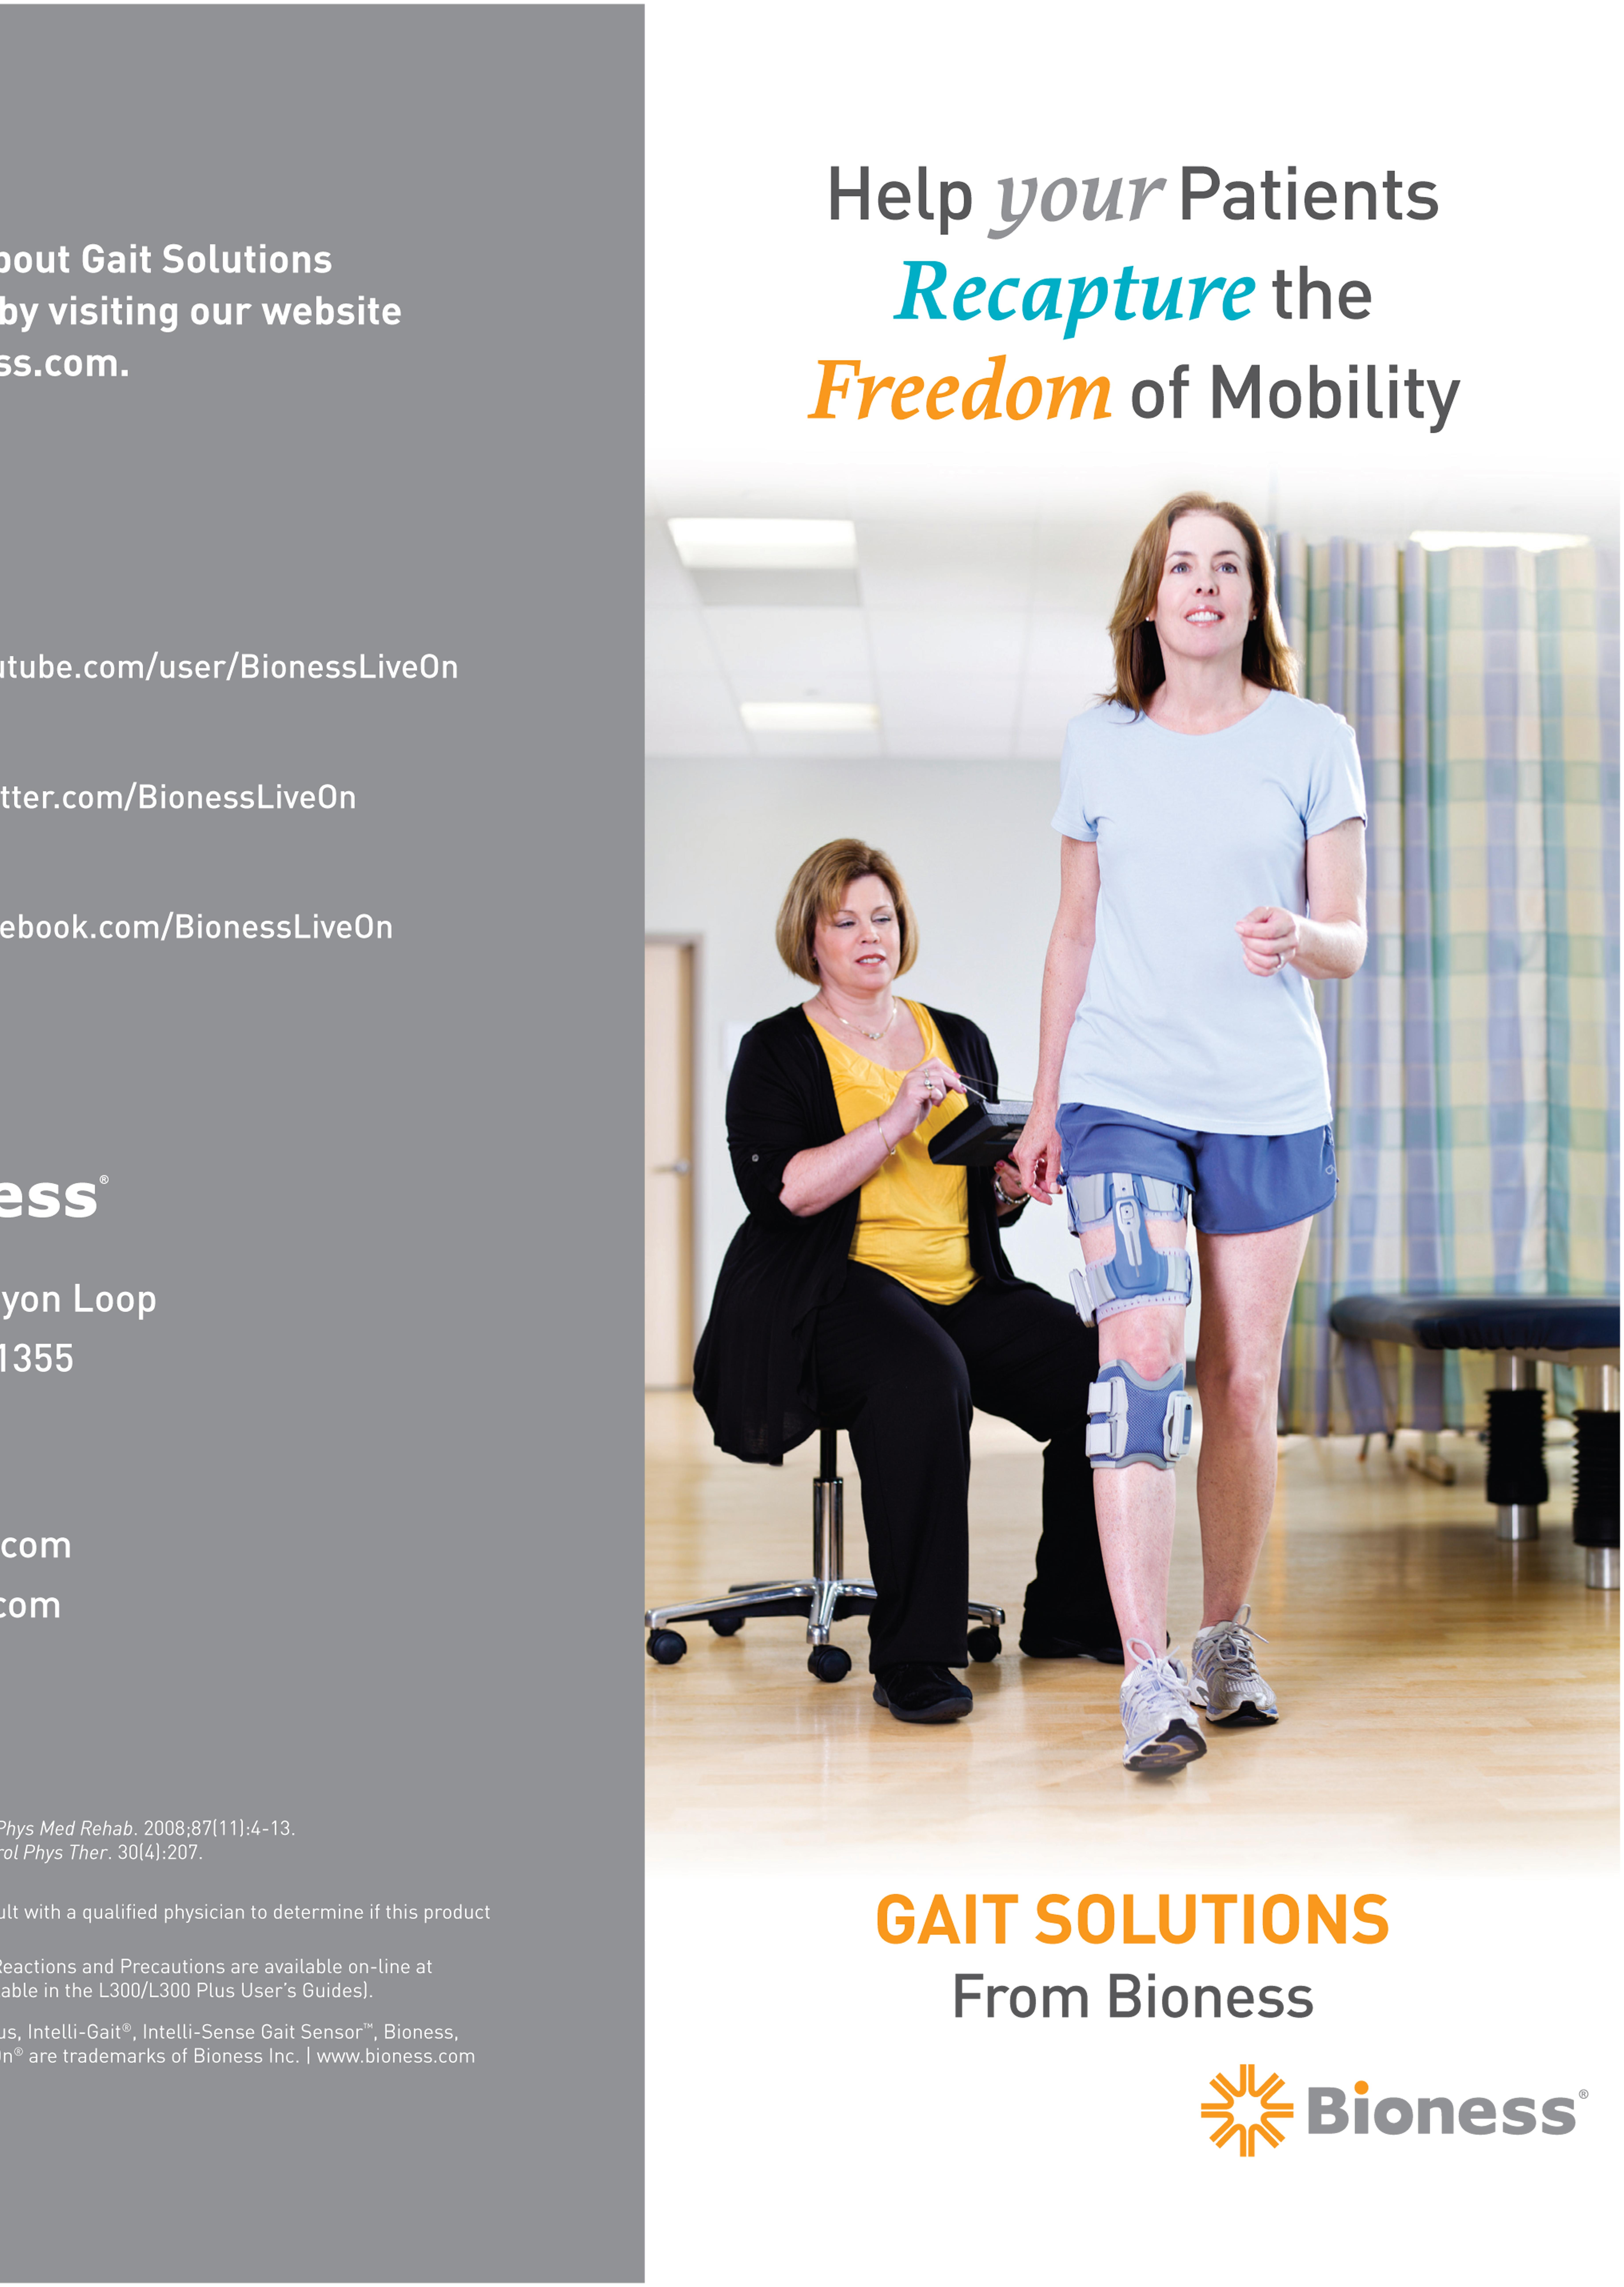 Bioness Inc Fes Technology